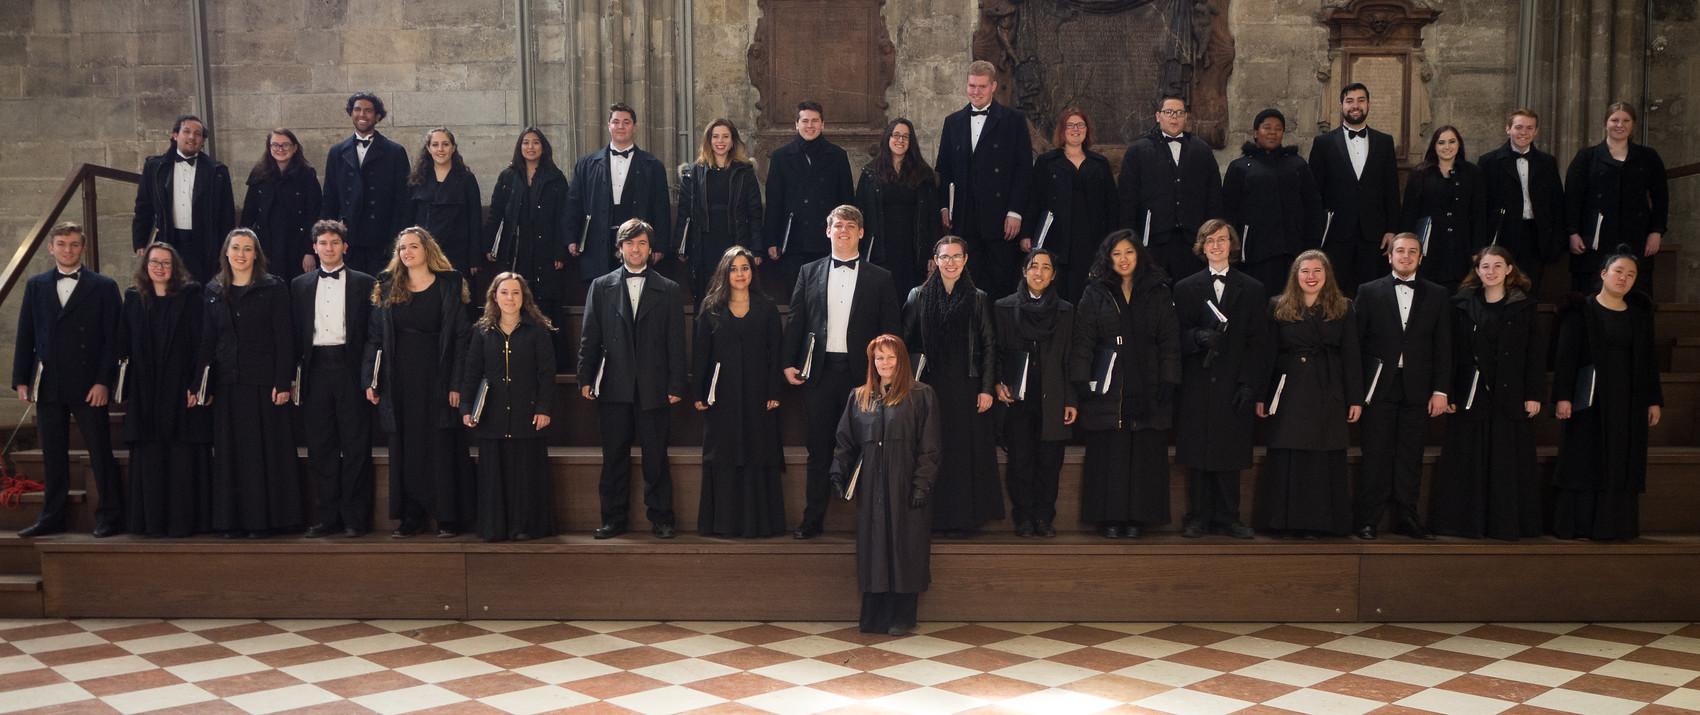 The WP Chamber Choir. Photo, David Kerzner.